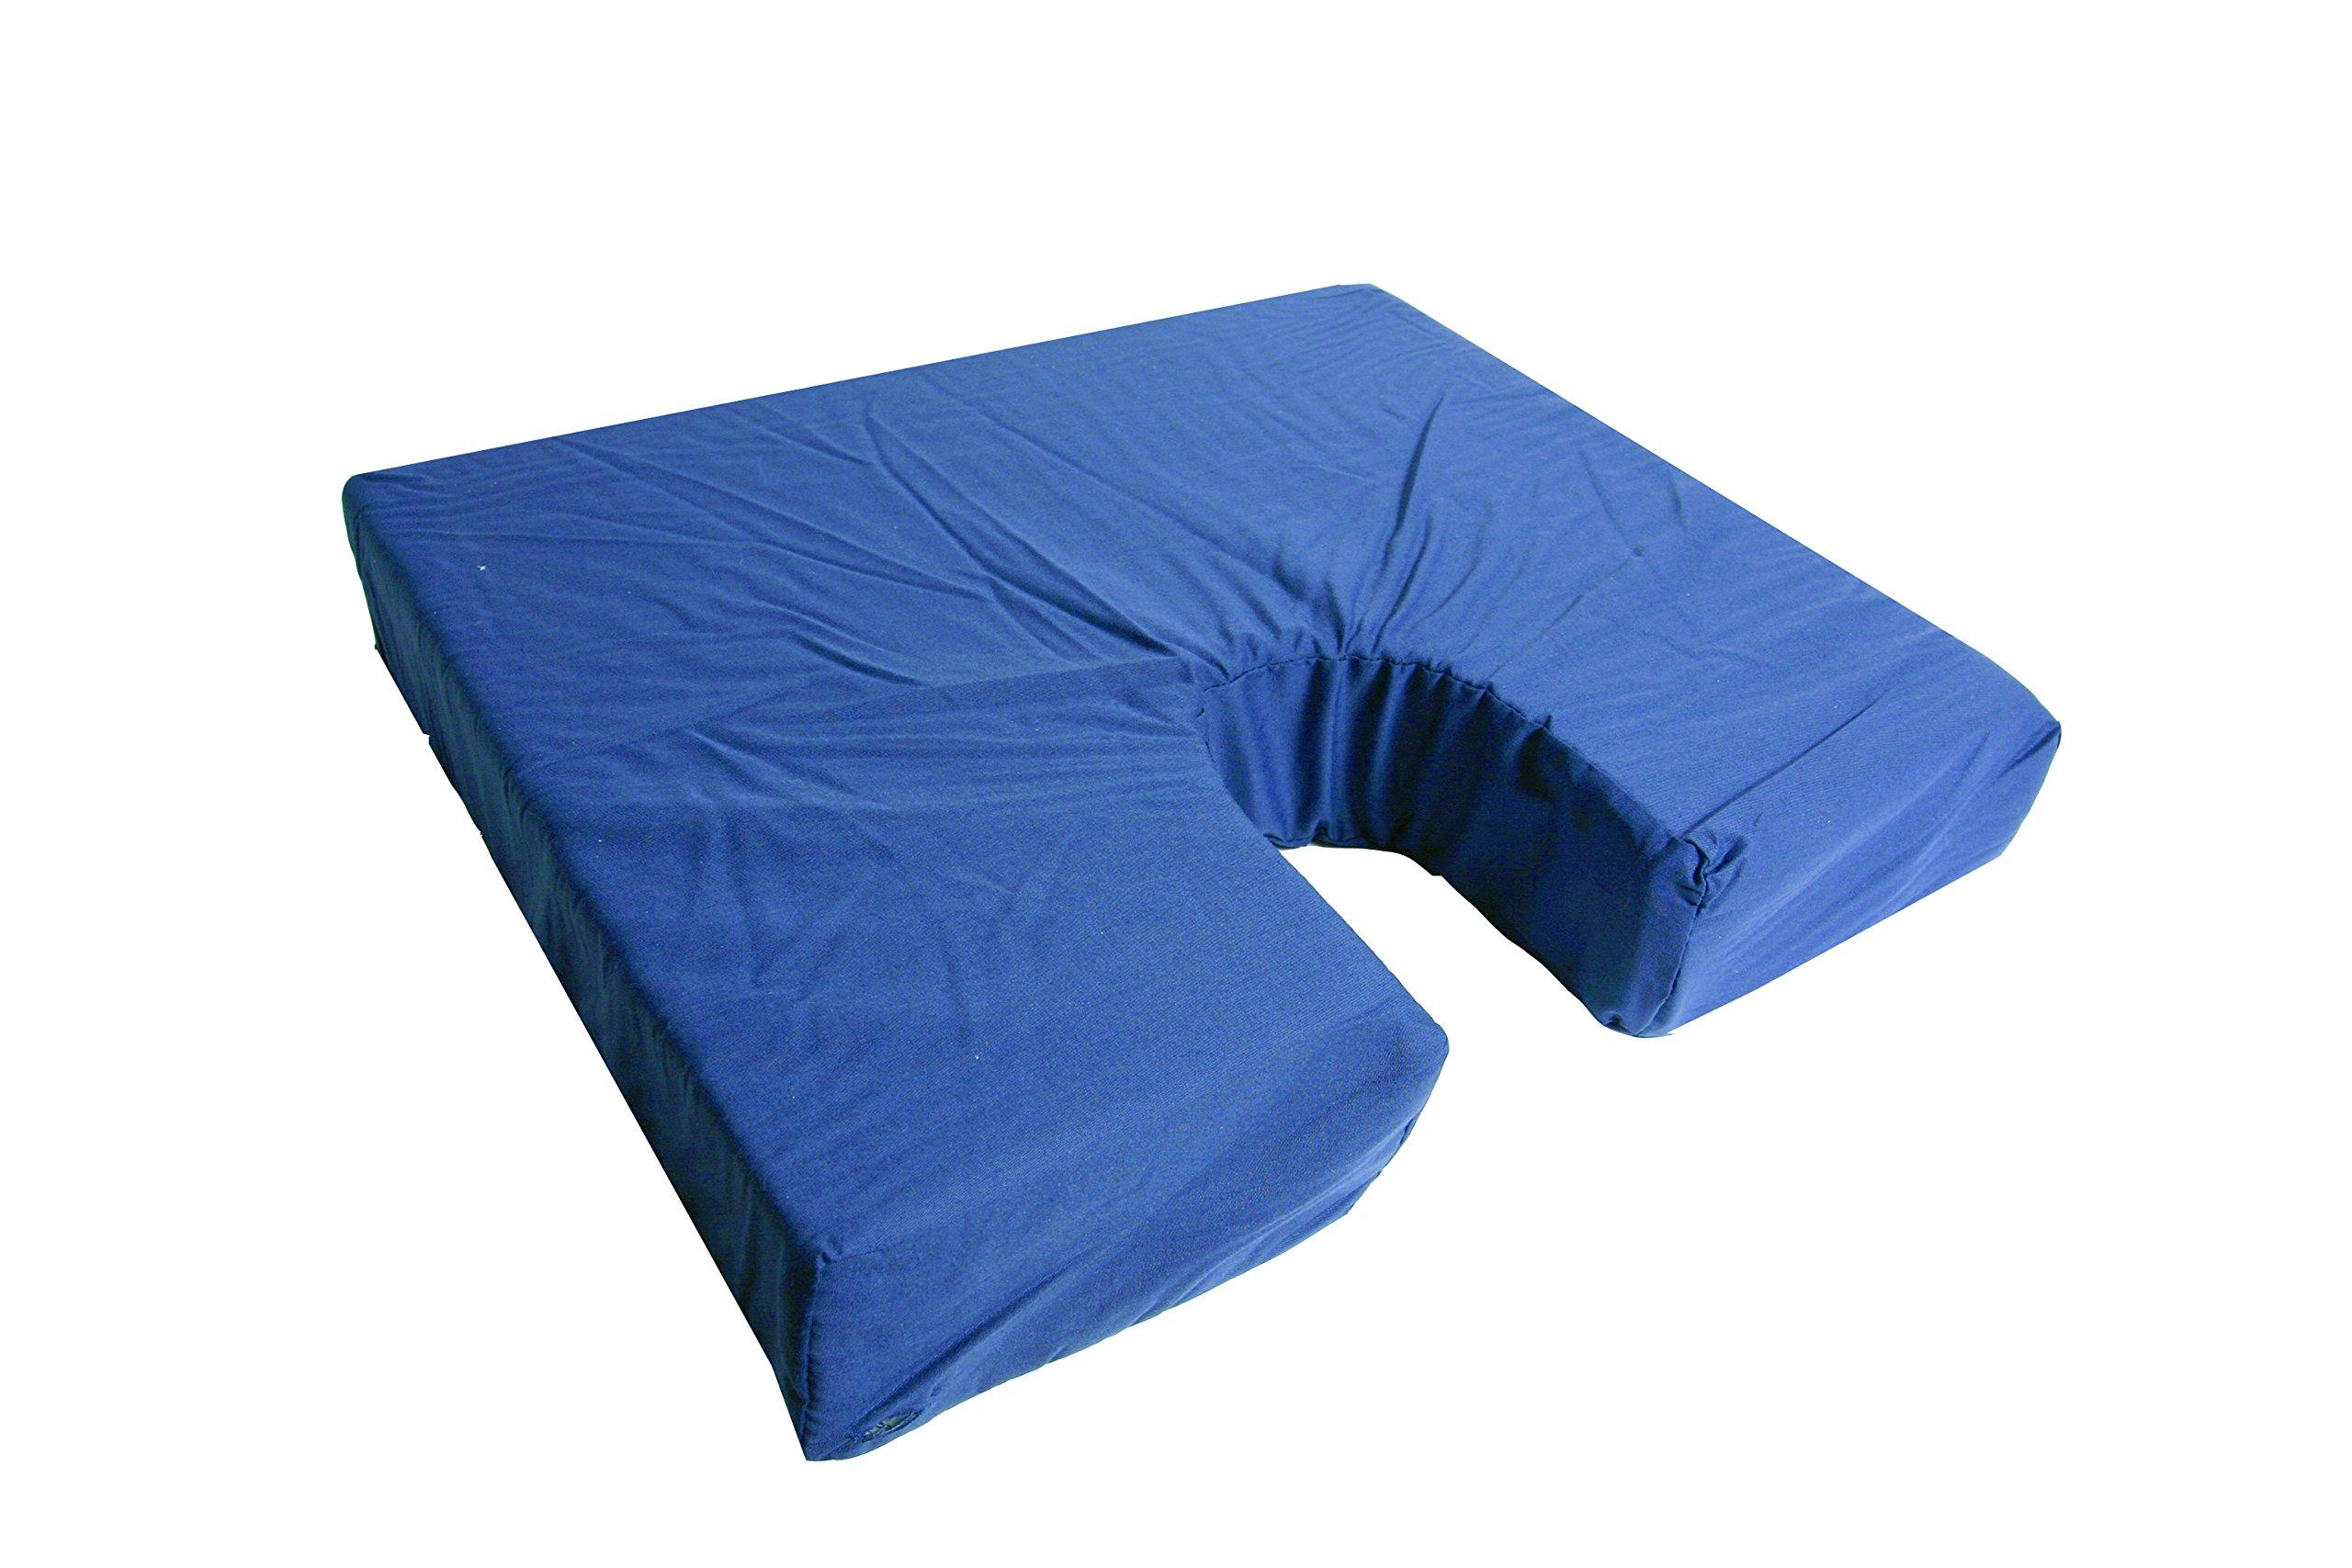 Geneva Healthcare Coccyx Seat Cushion - 16'' x 18'' x 3'' - 6/CS